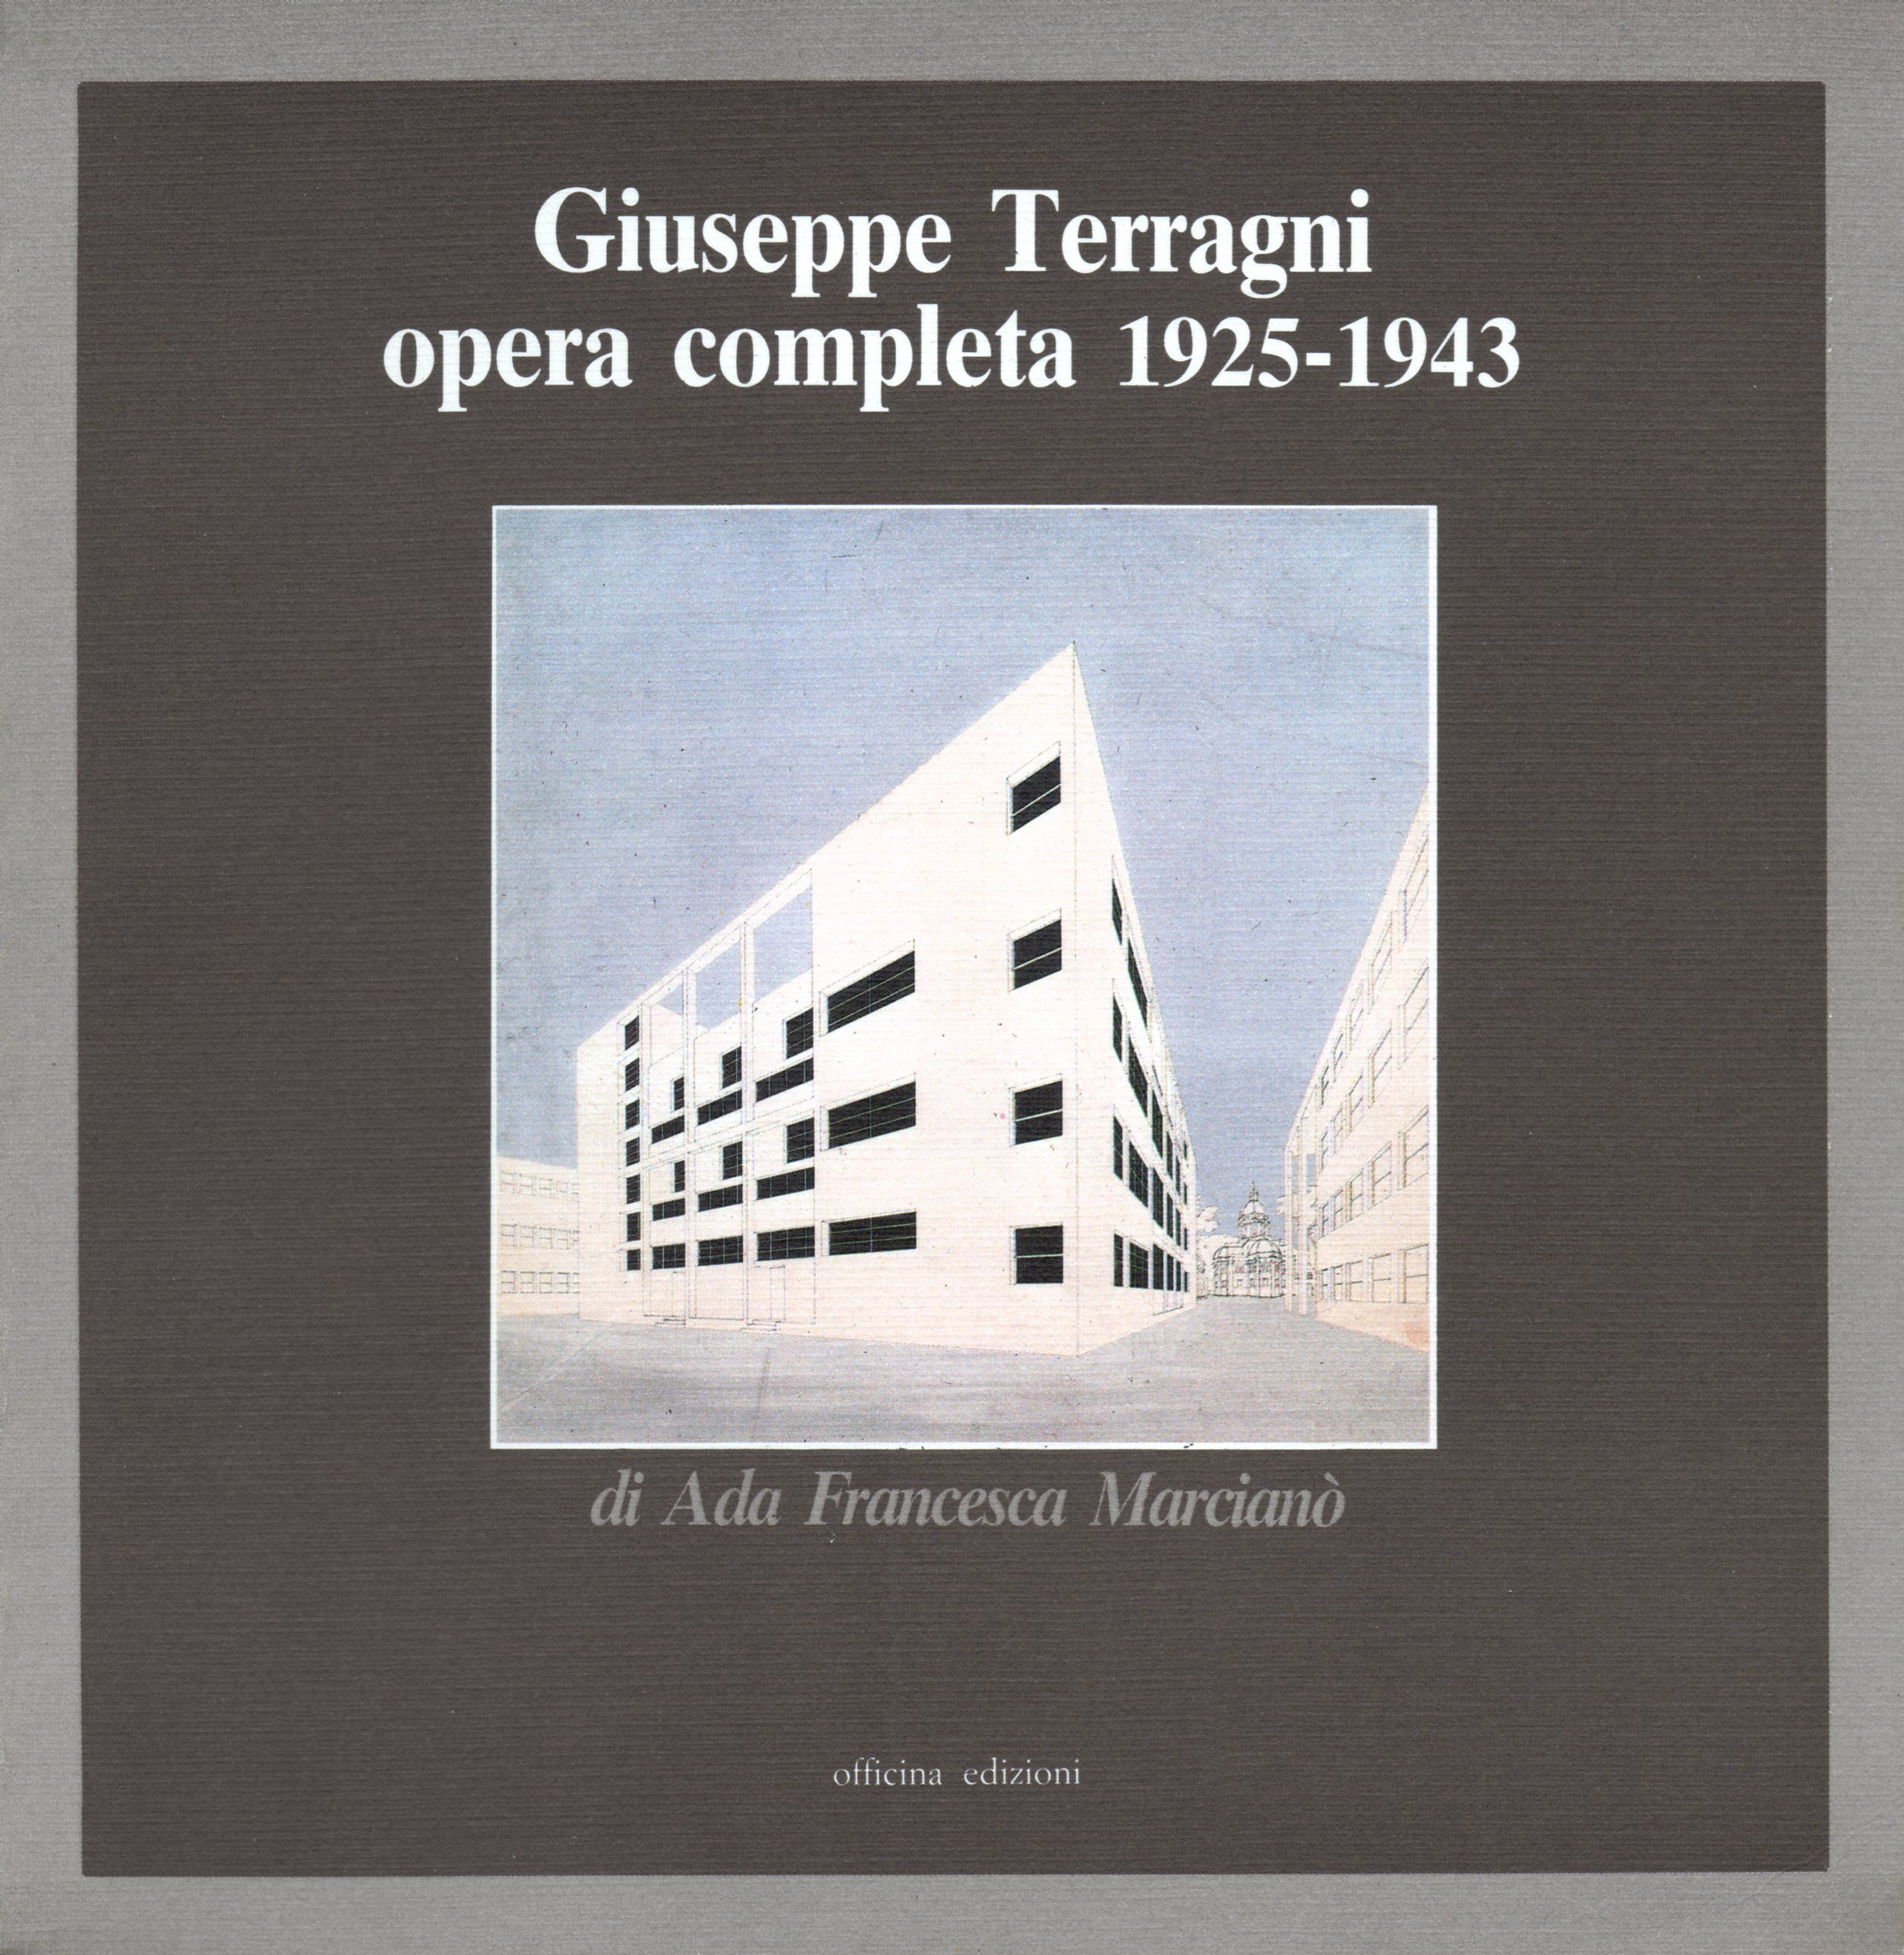 Giuseppe Terragni. Opera completa 1925-1943